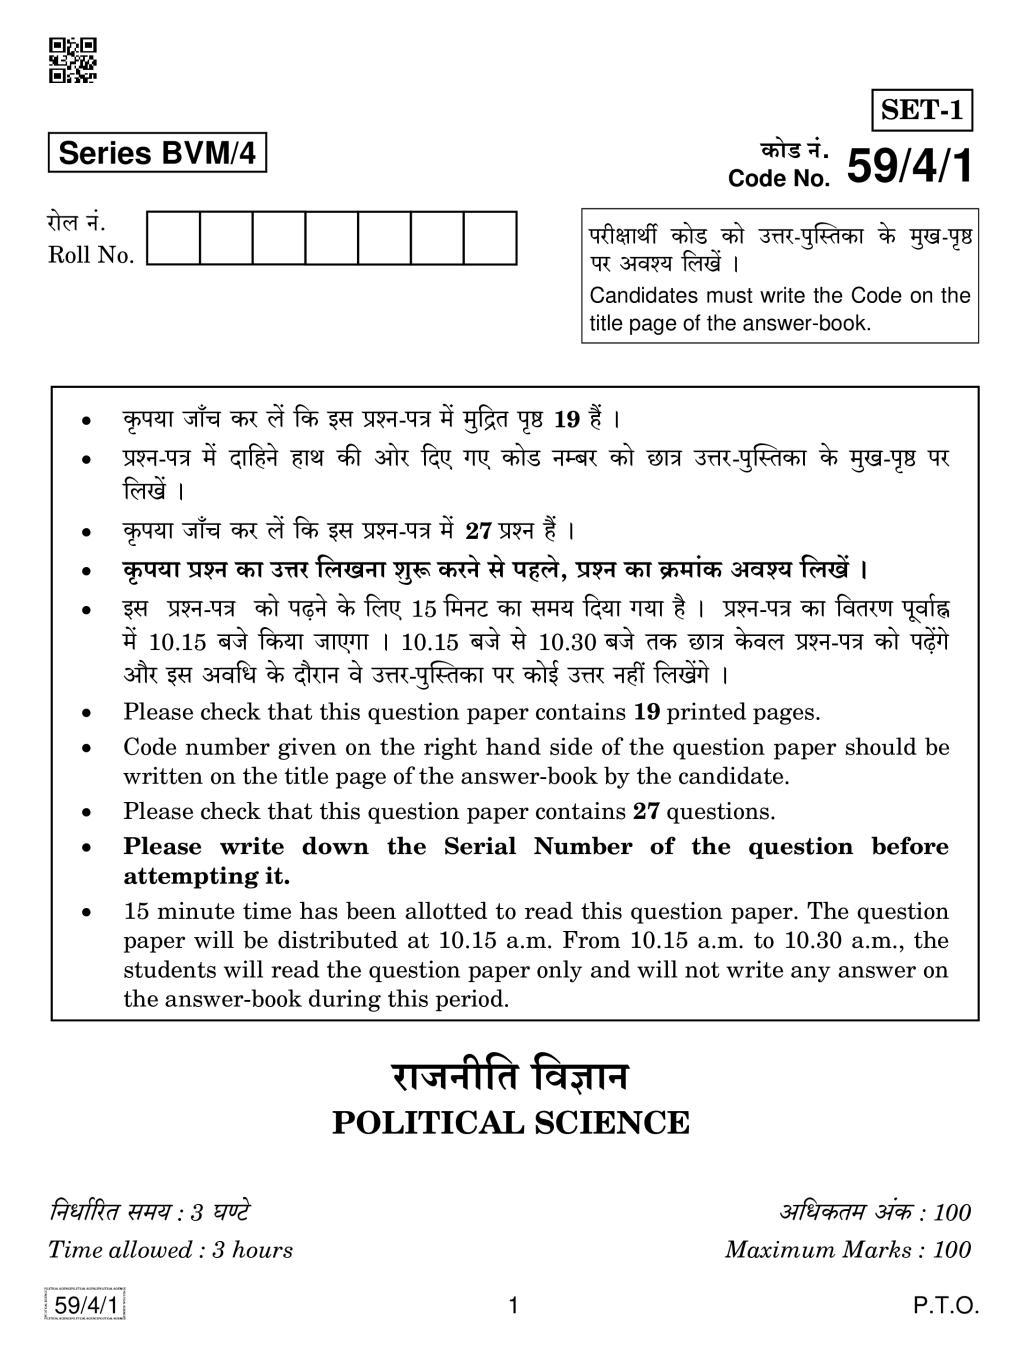 CBSE Class 12 Political Science Question Paper 2019 Set 4 - Page 1